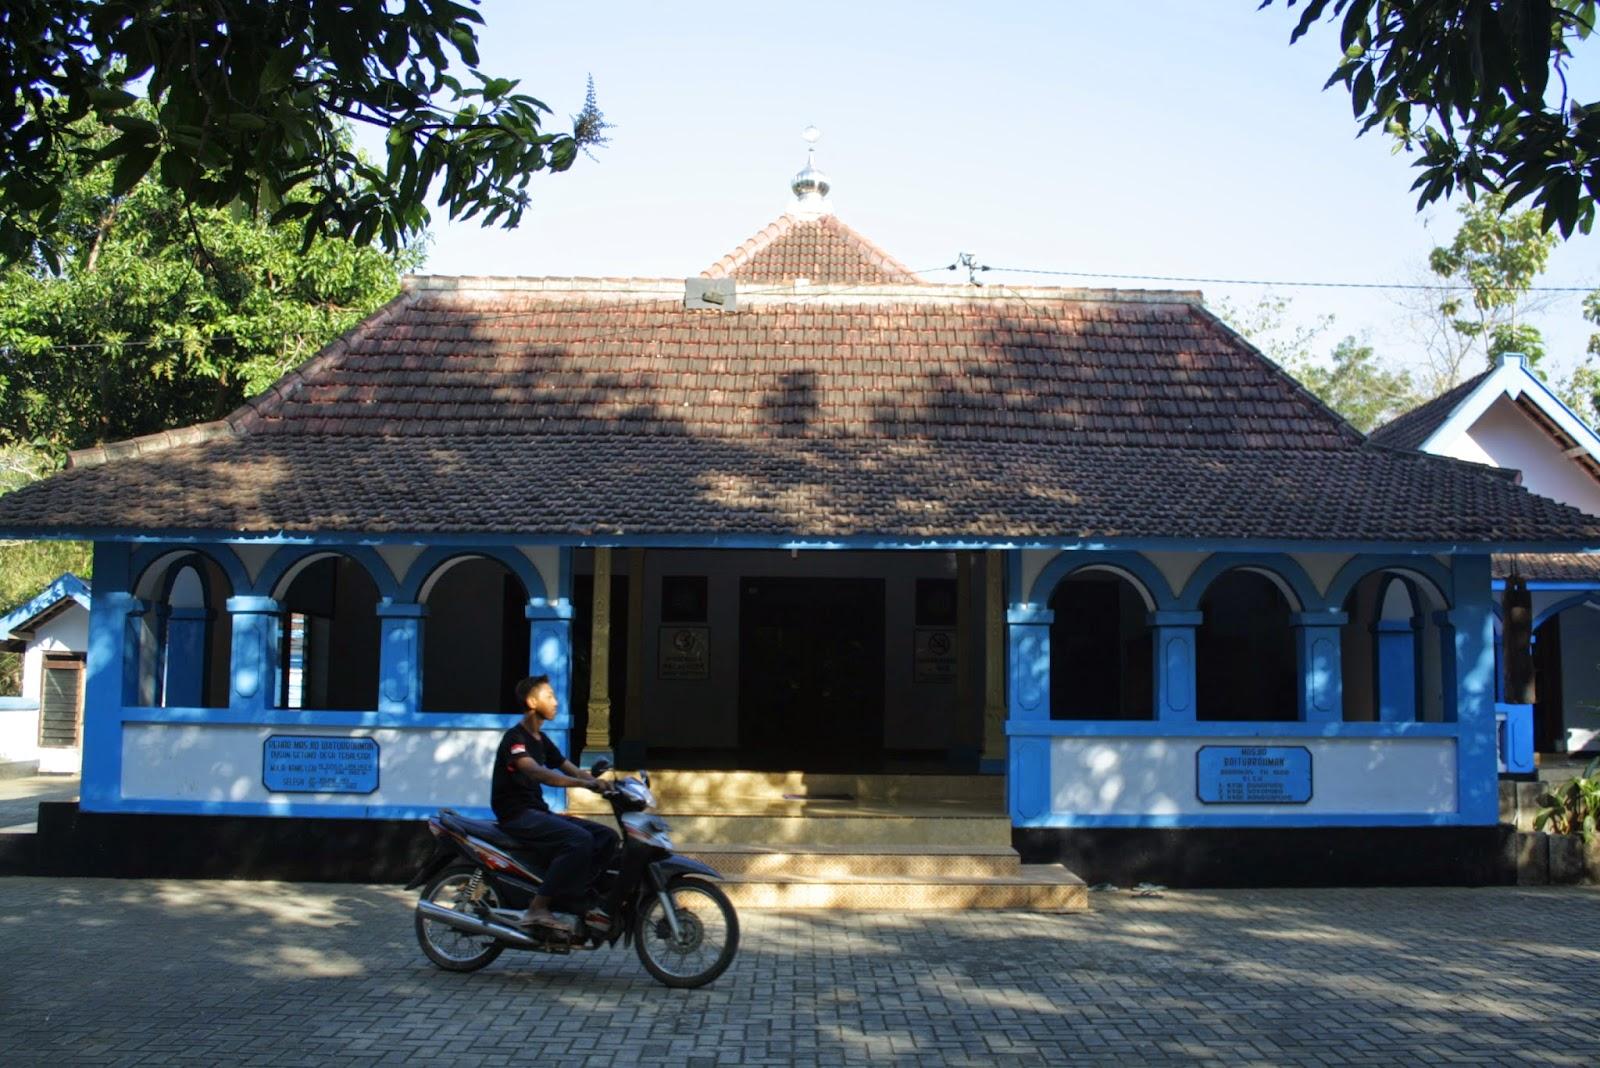 Masjid Baiturrahman Tempat Berguru Pendiri Tegalsari Kanalponorogo Kab Ponorogo